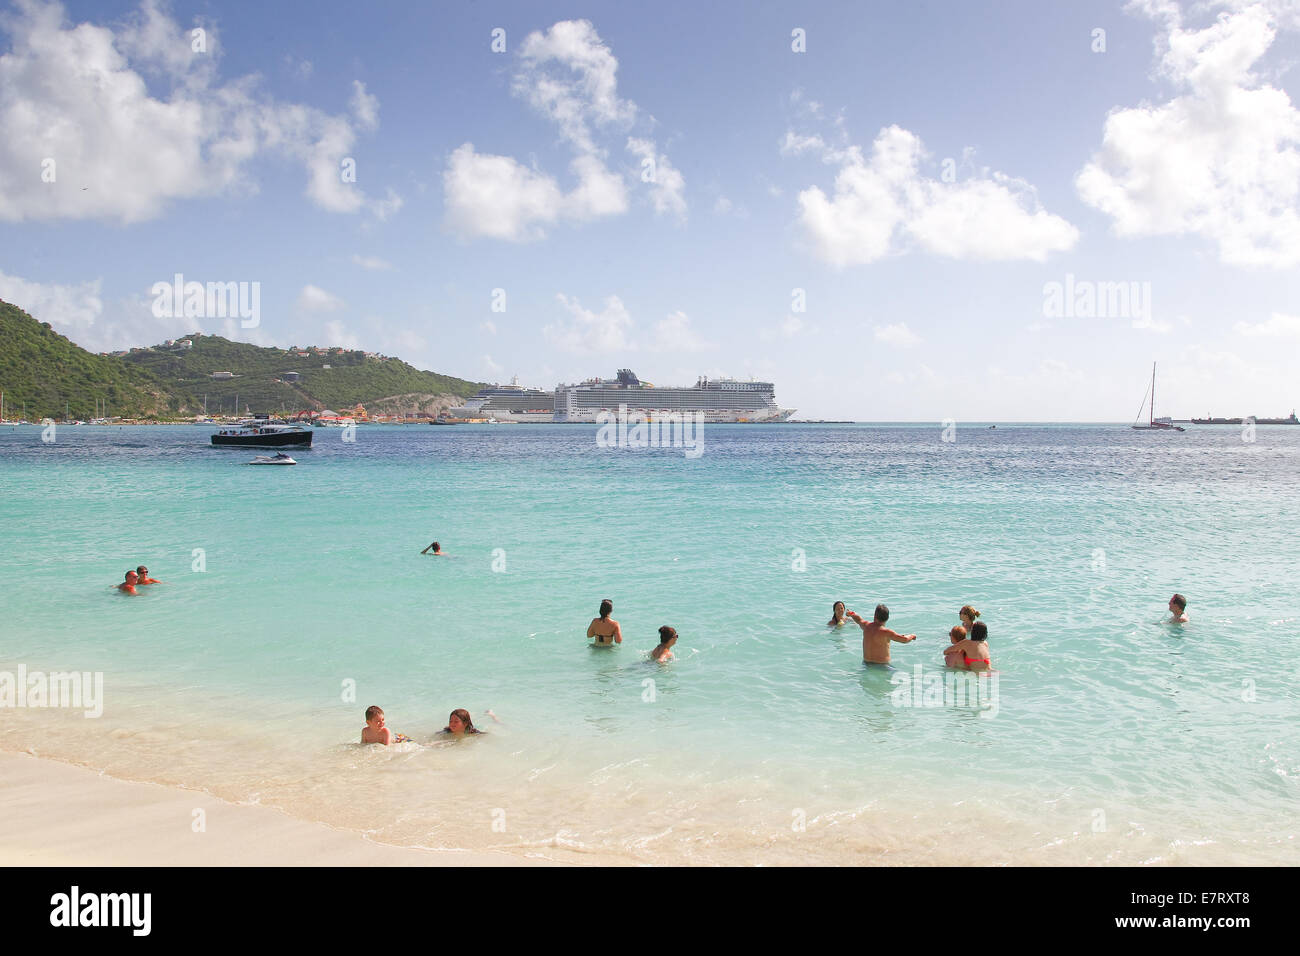 The Beach St Maarten with Azura in port behind - Stock Image